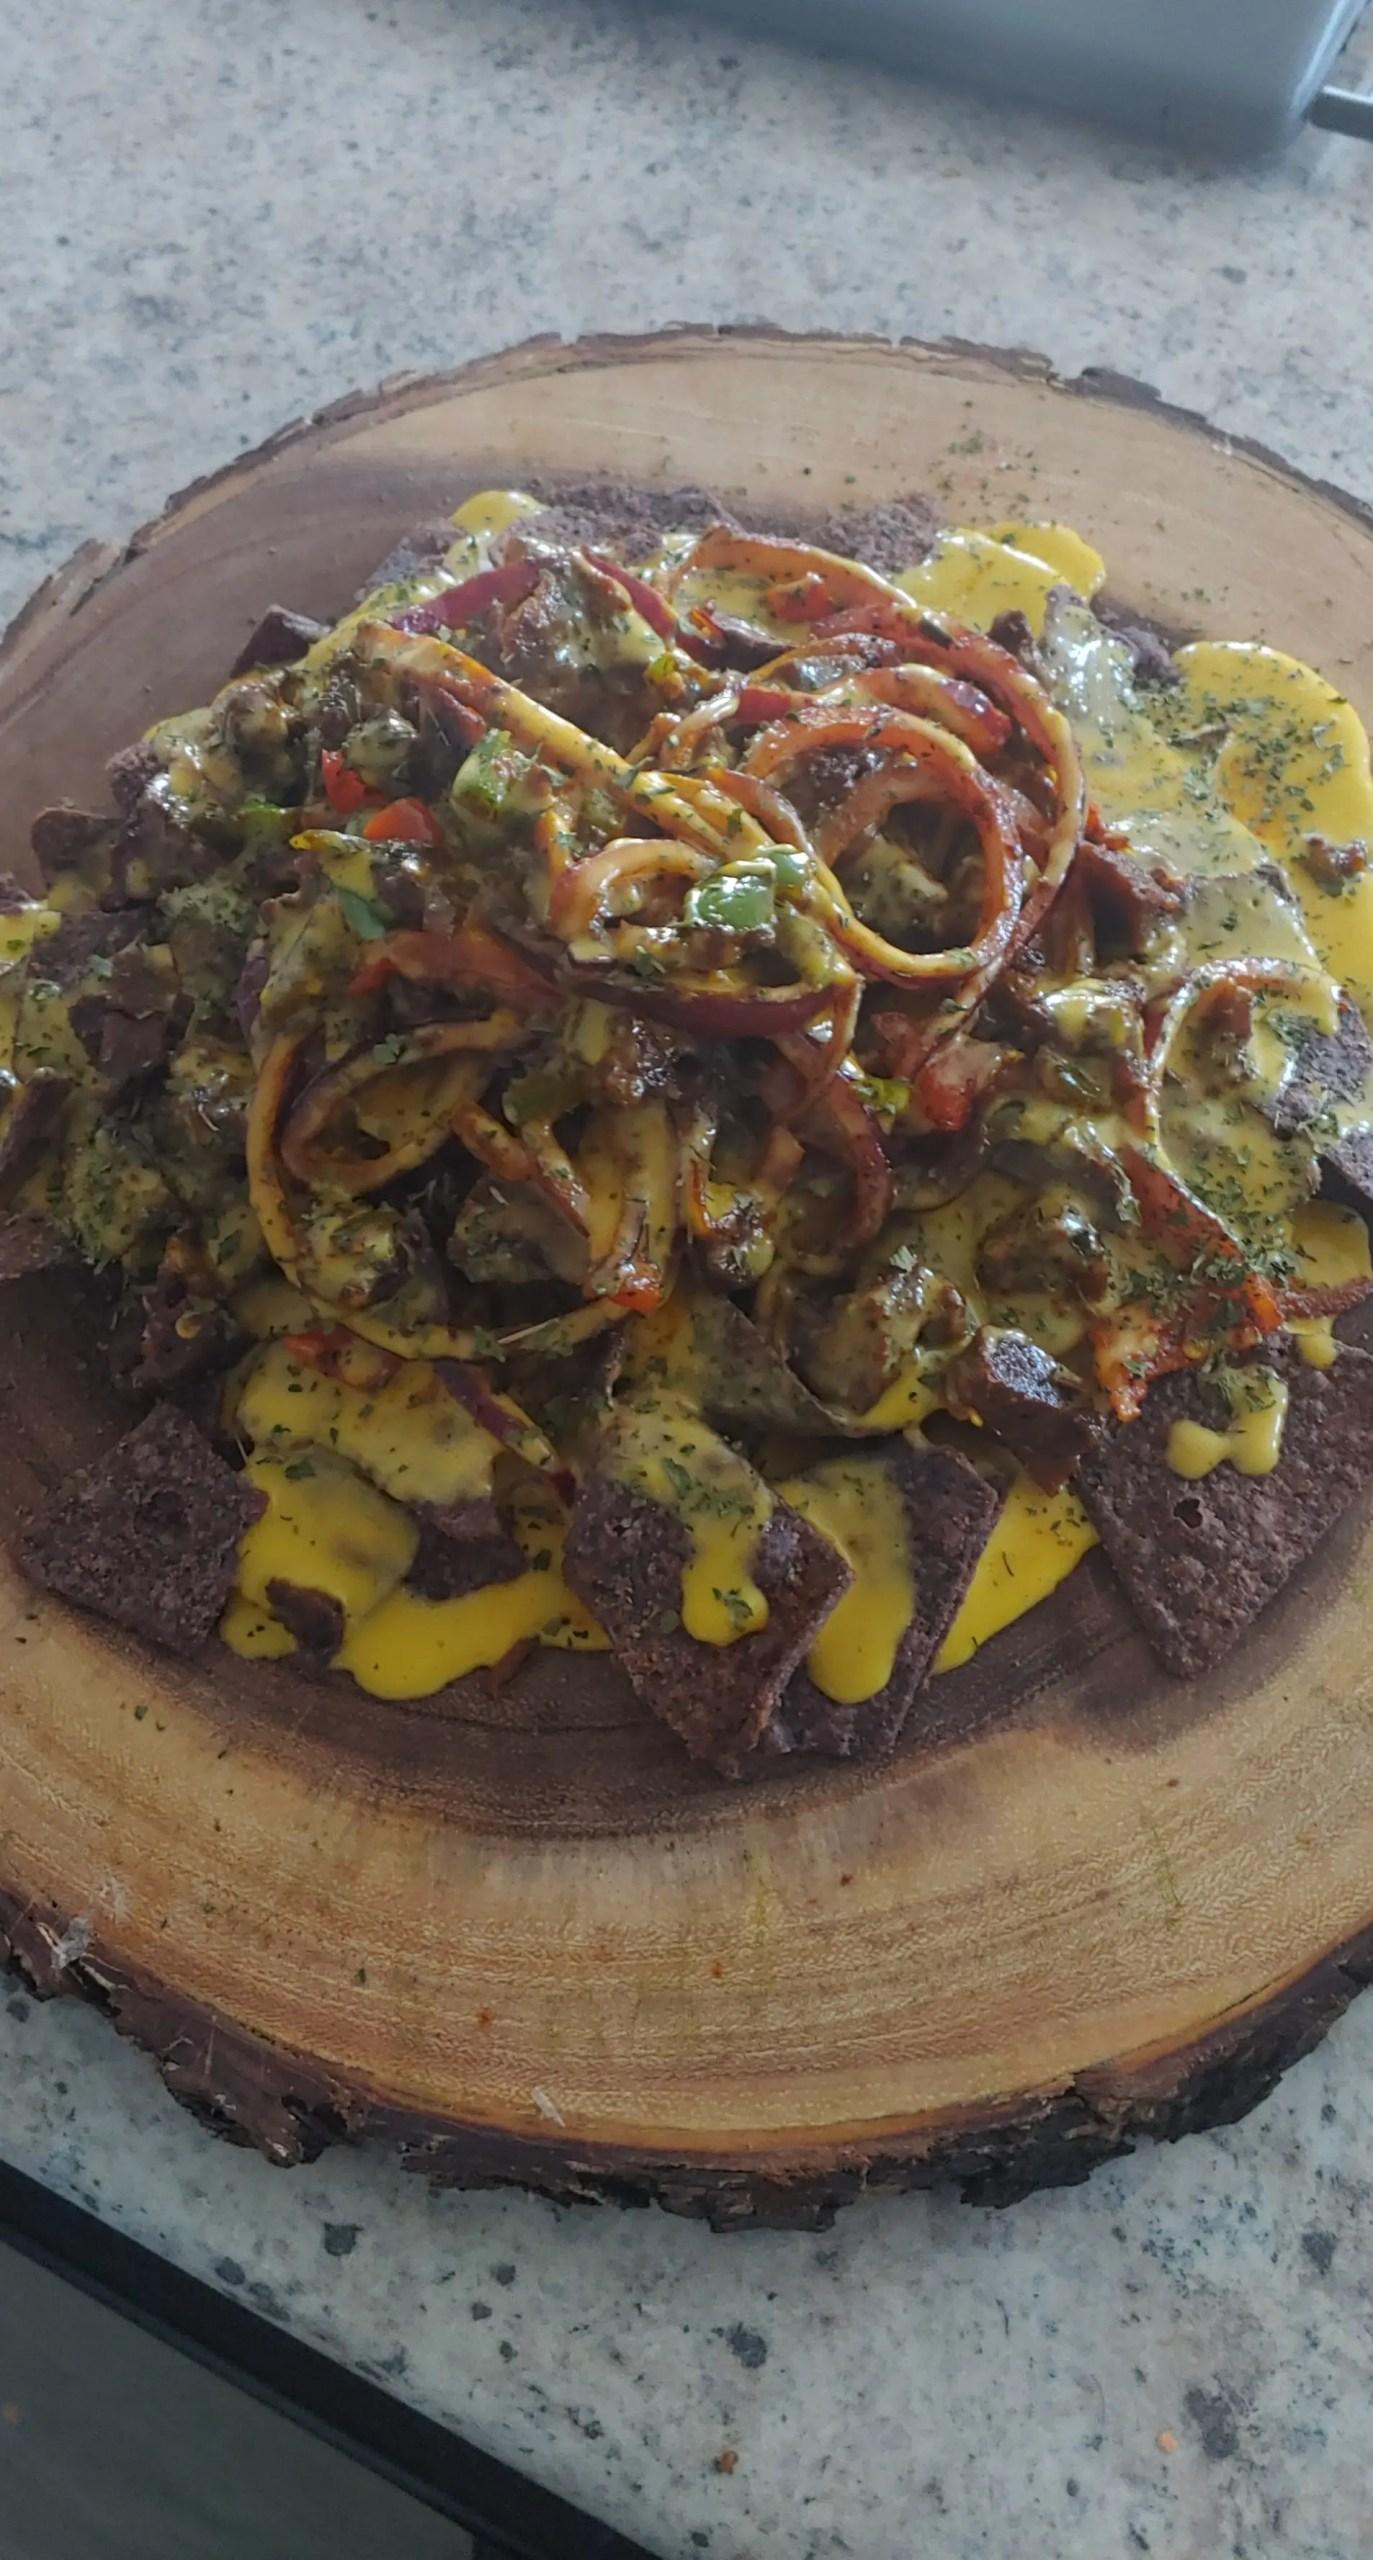 O yeah It's Vegan Food Truck taco plate